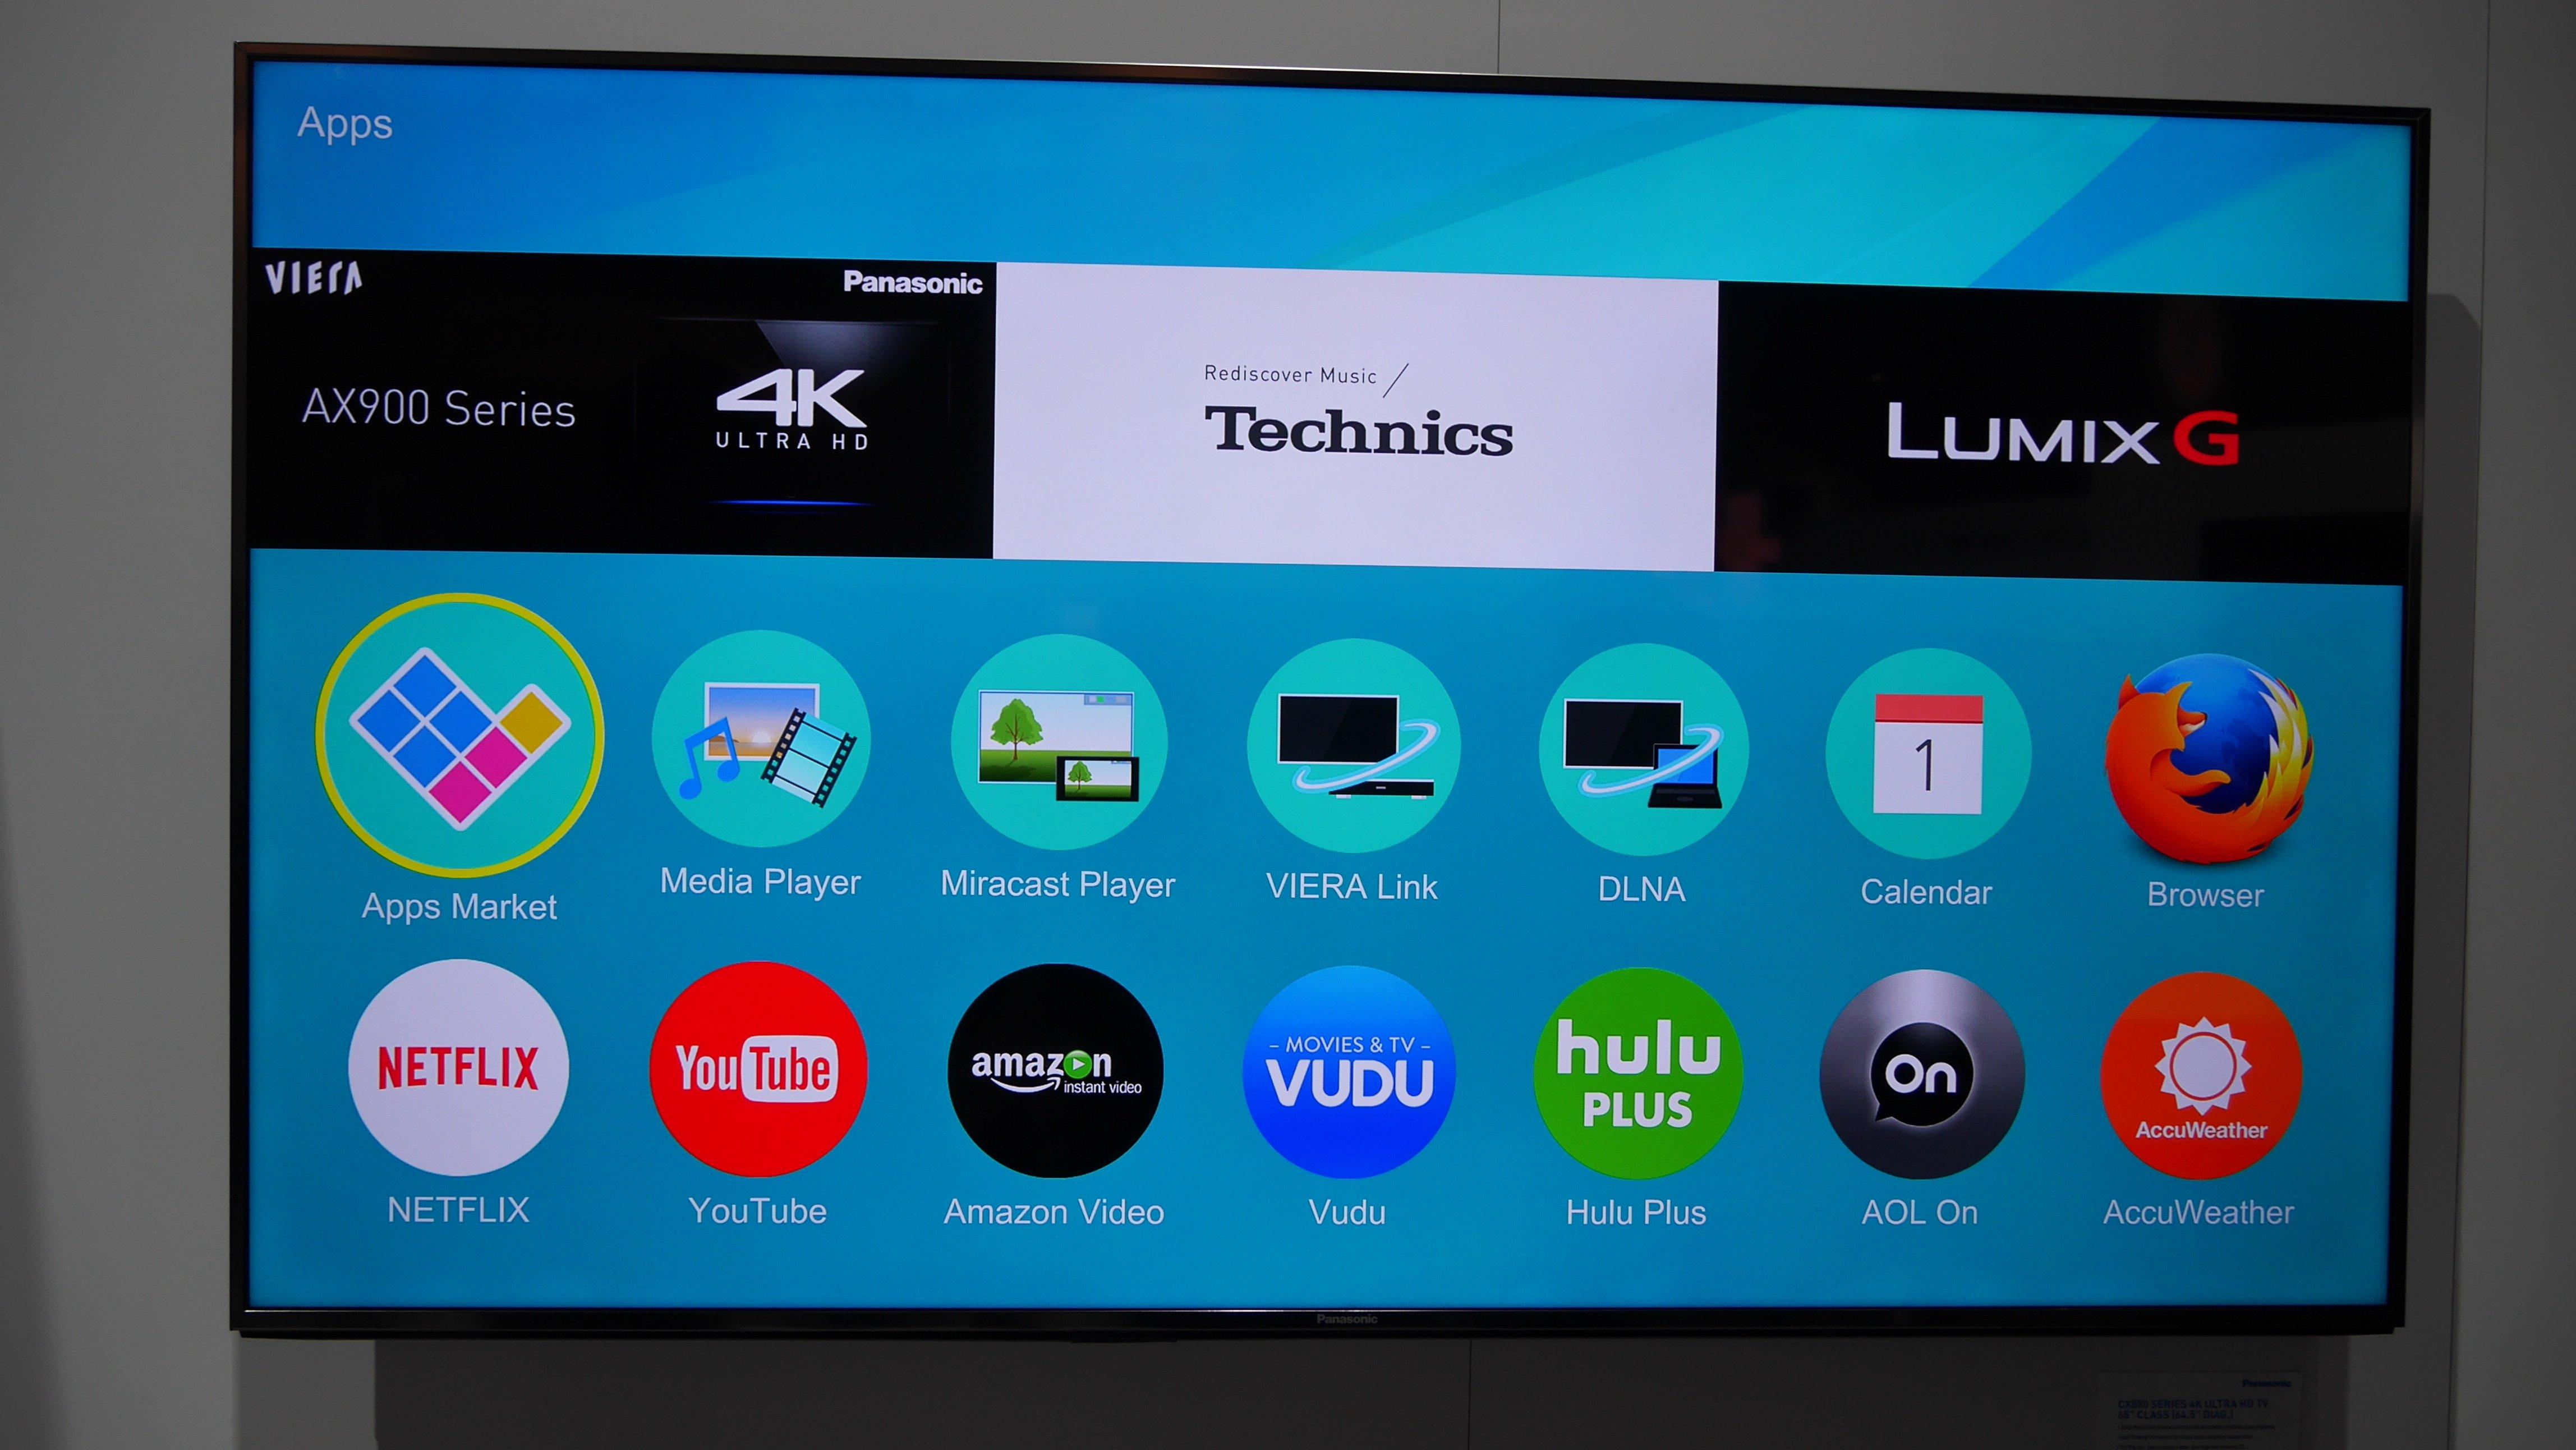 panasonic firefox os smart tv review first look expert reviews. Black Bedroom Furniture Sets. Home Design Ideas